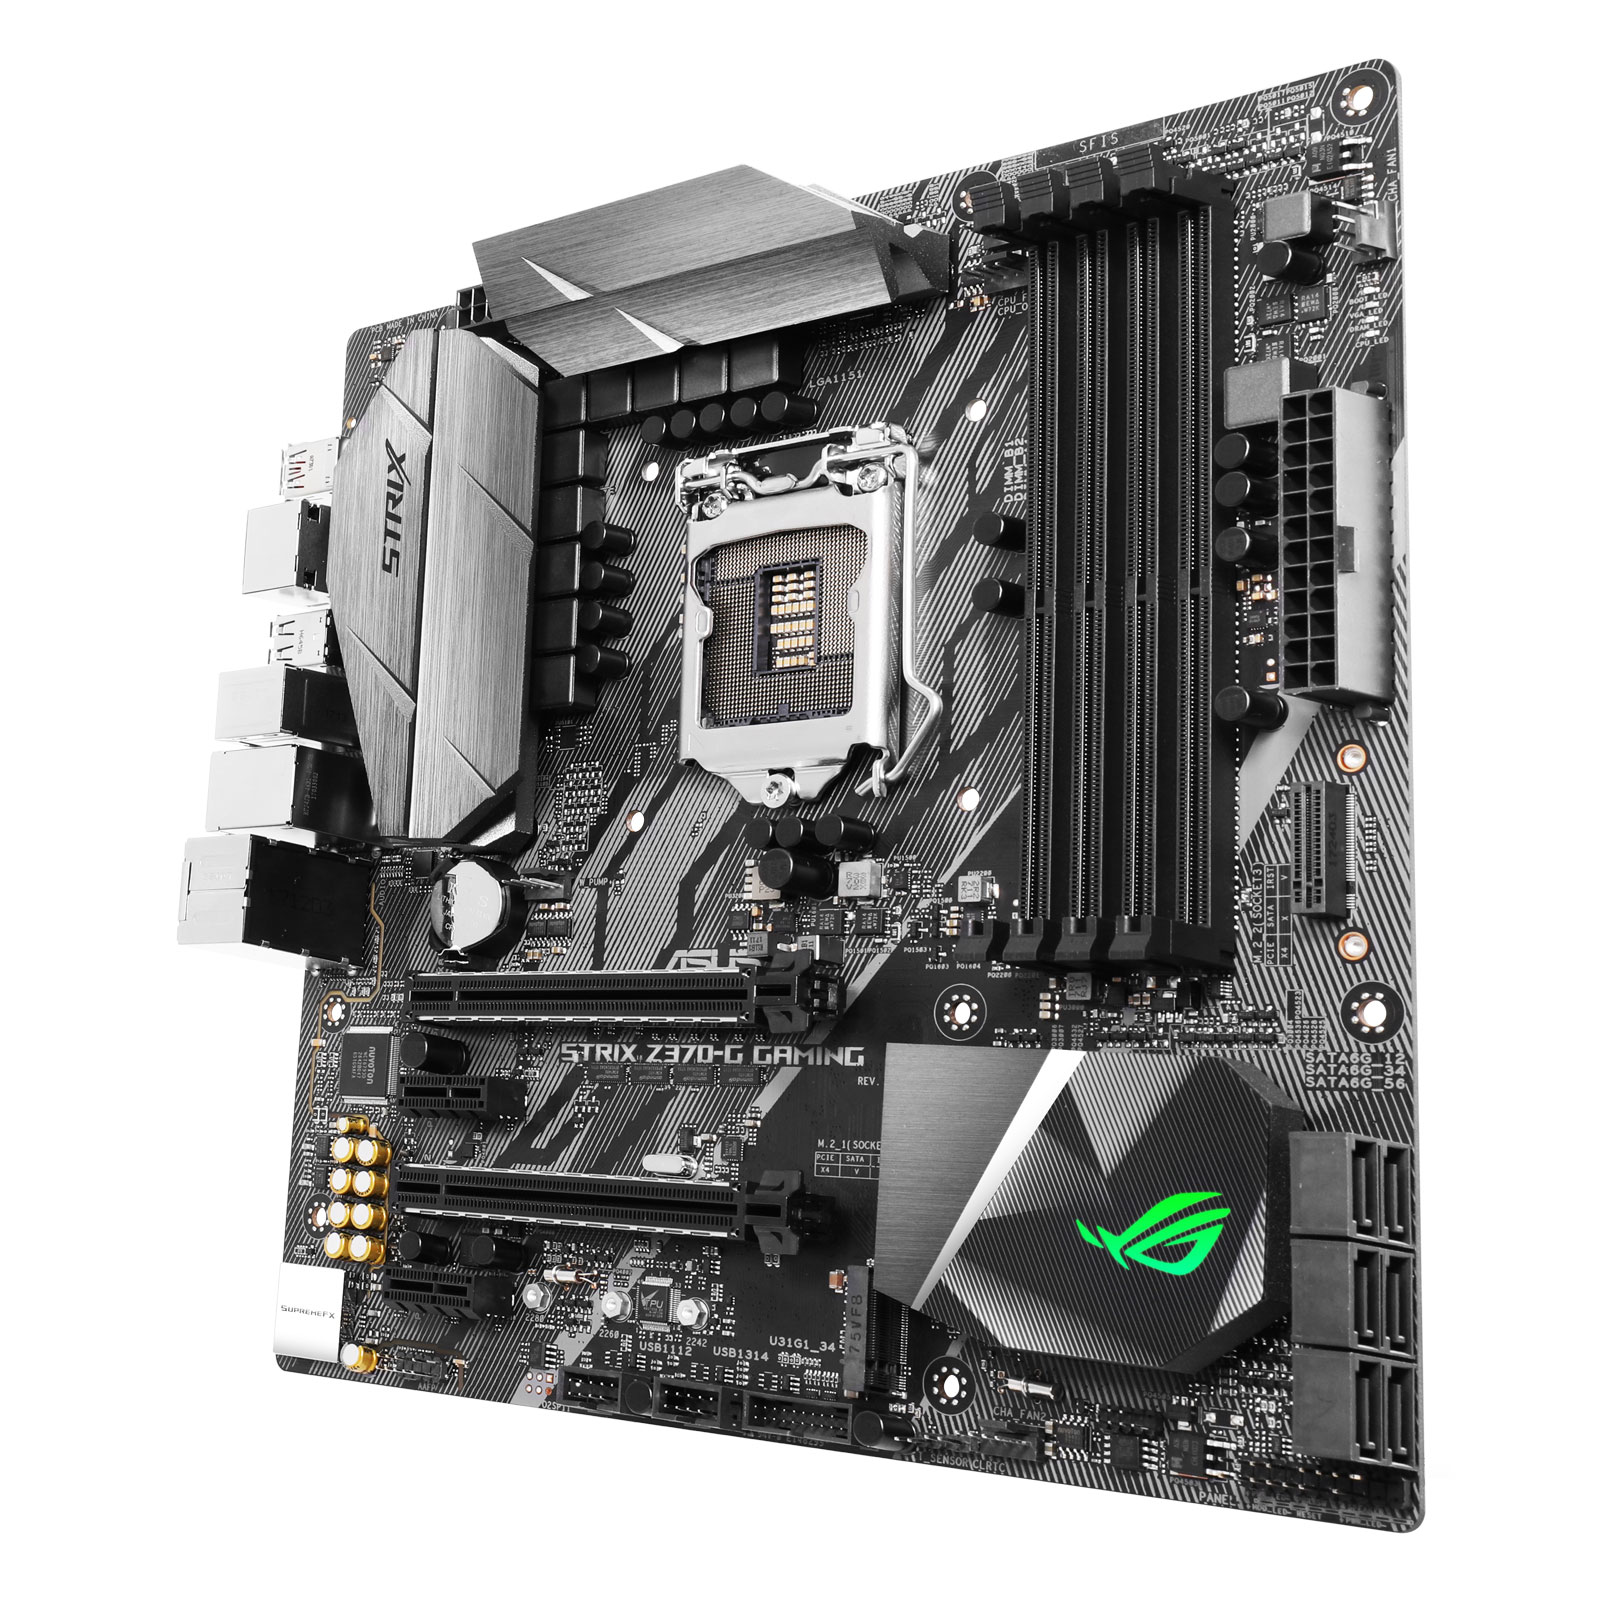 Carte mère ASUS ROG STRIX Z370-G GAMING Wi-Fi AC Carte mère Micro ATX Socket 1151 Intel Z370 Express - 4x DDR4 - SATA 6Gb/s + M.2 - USB 3.1 - Wi-Fi AC/Bluetooth 4.2 - 3x PCI-Express 3.0 16x